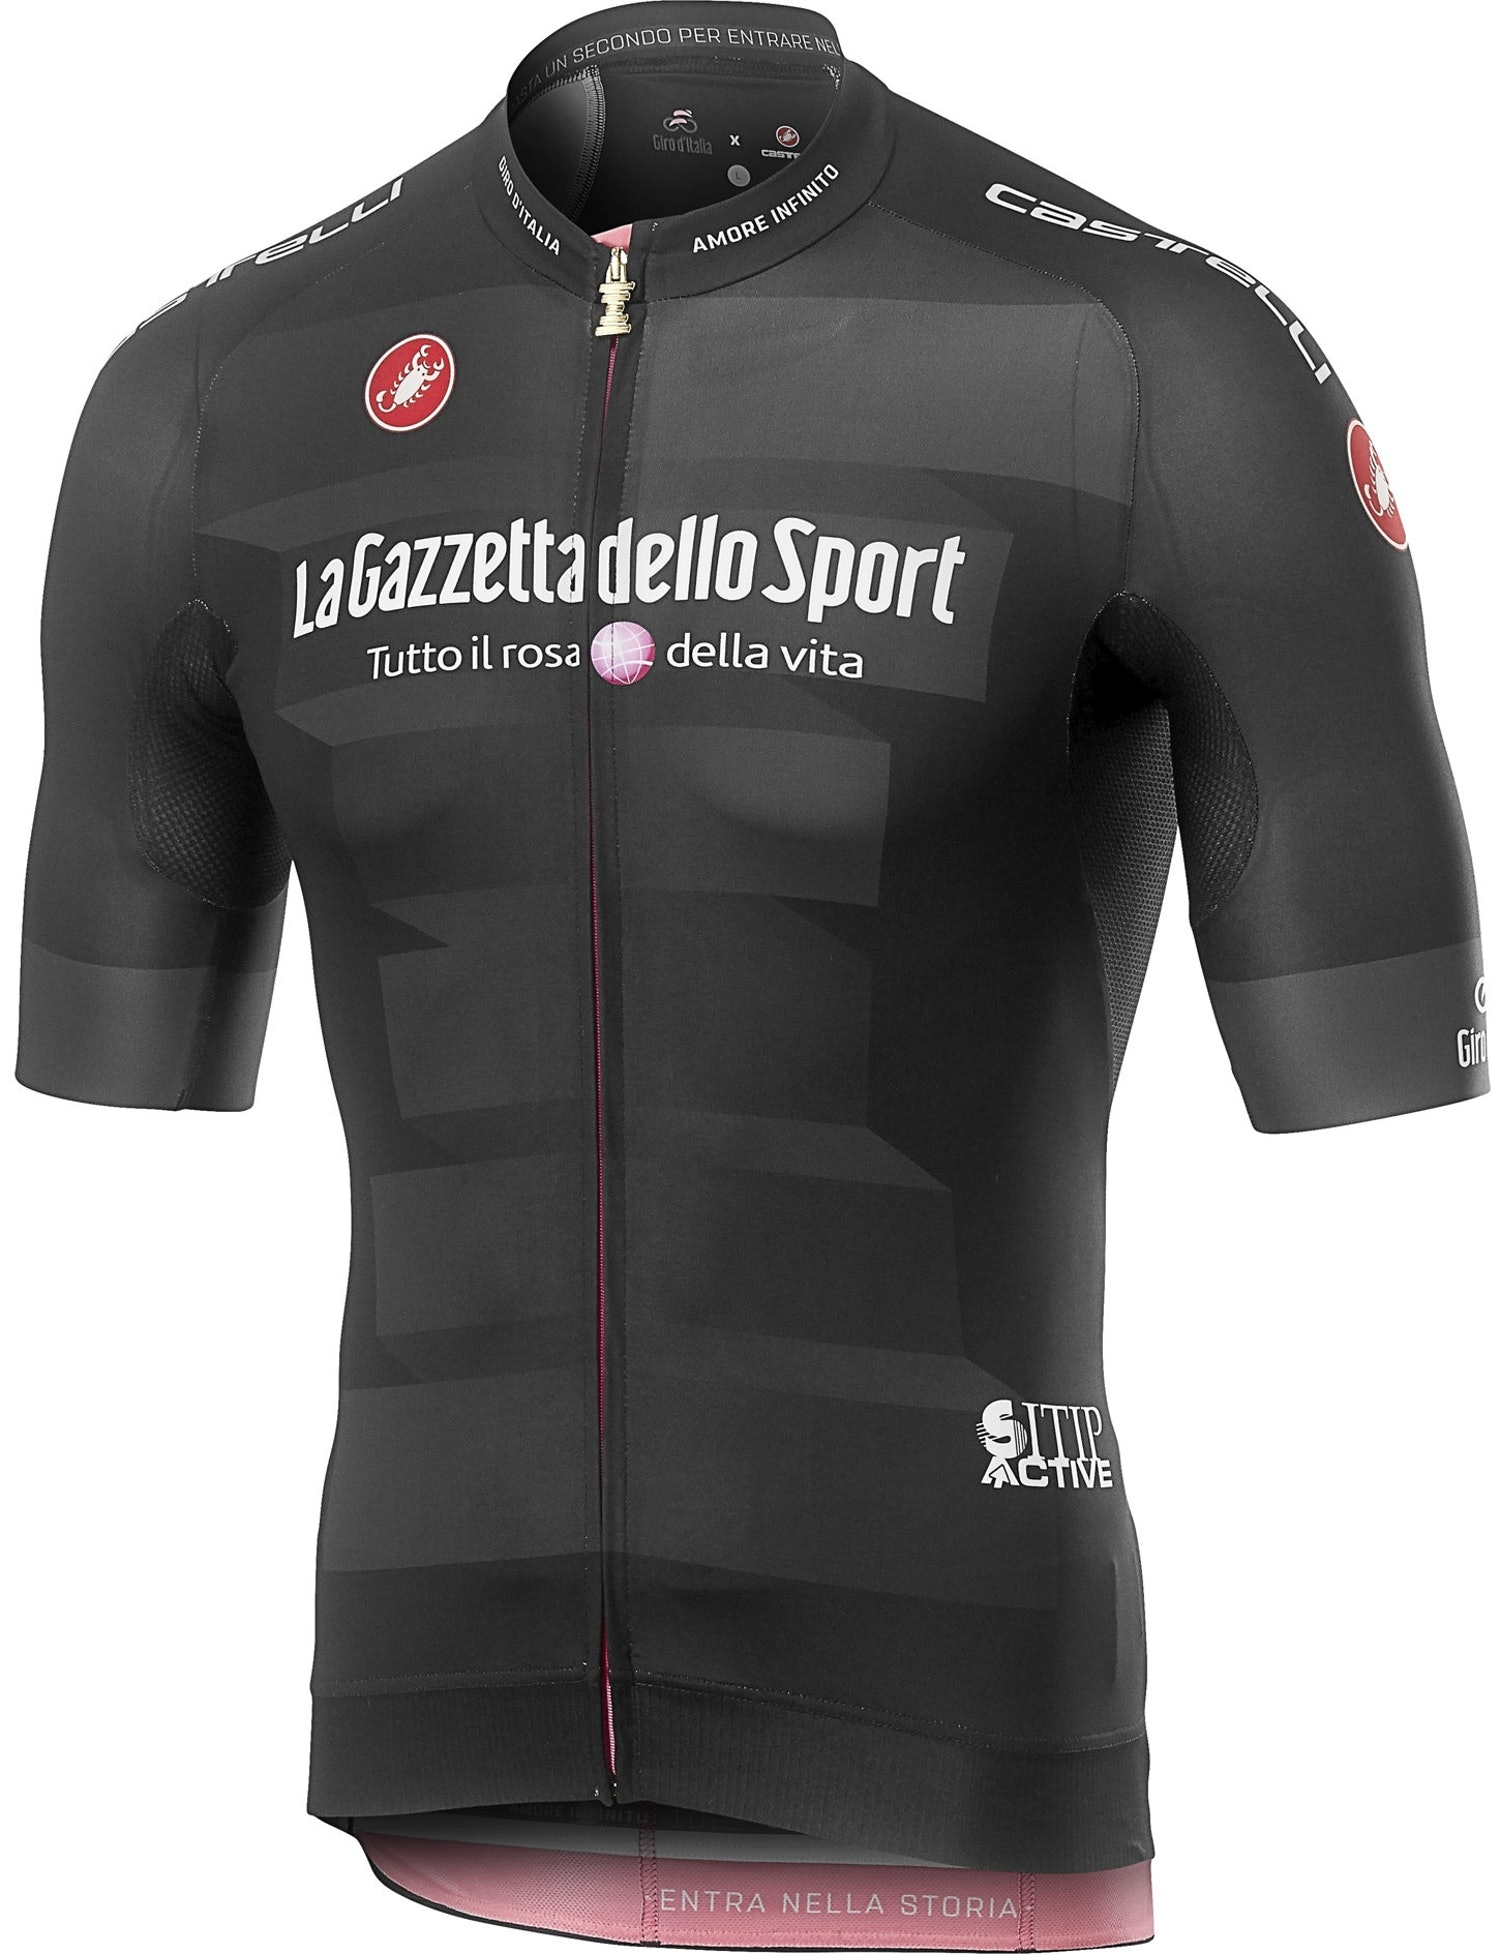 Castelli #Giro102 Race - Maglia Nera Giro d'Italia 2019 - uomo